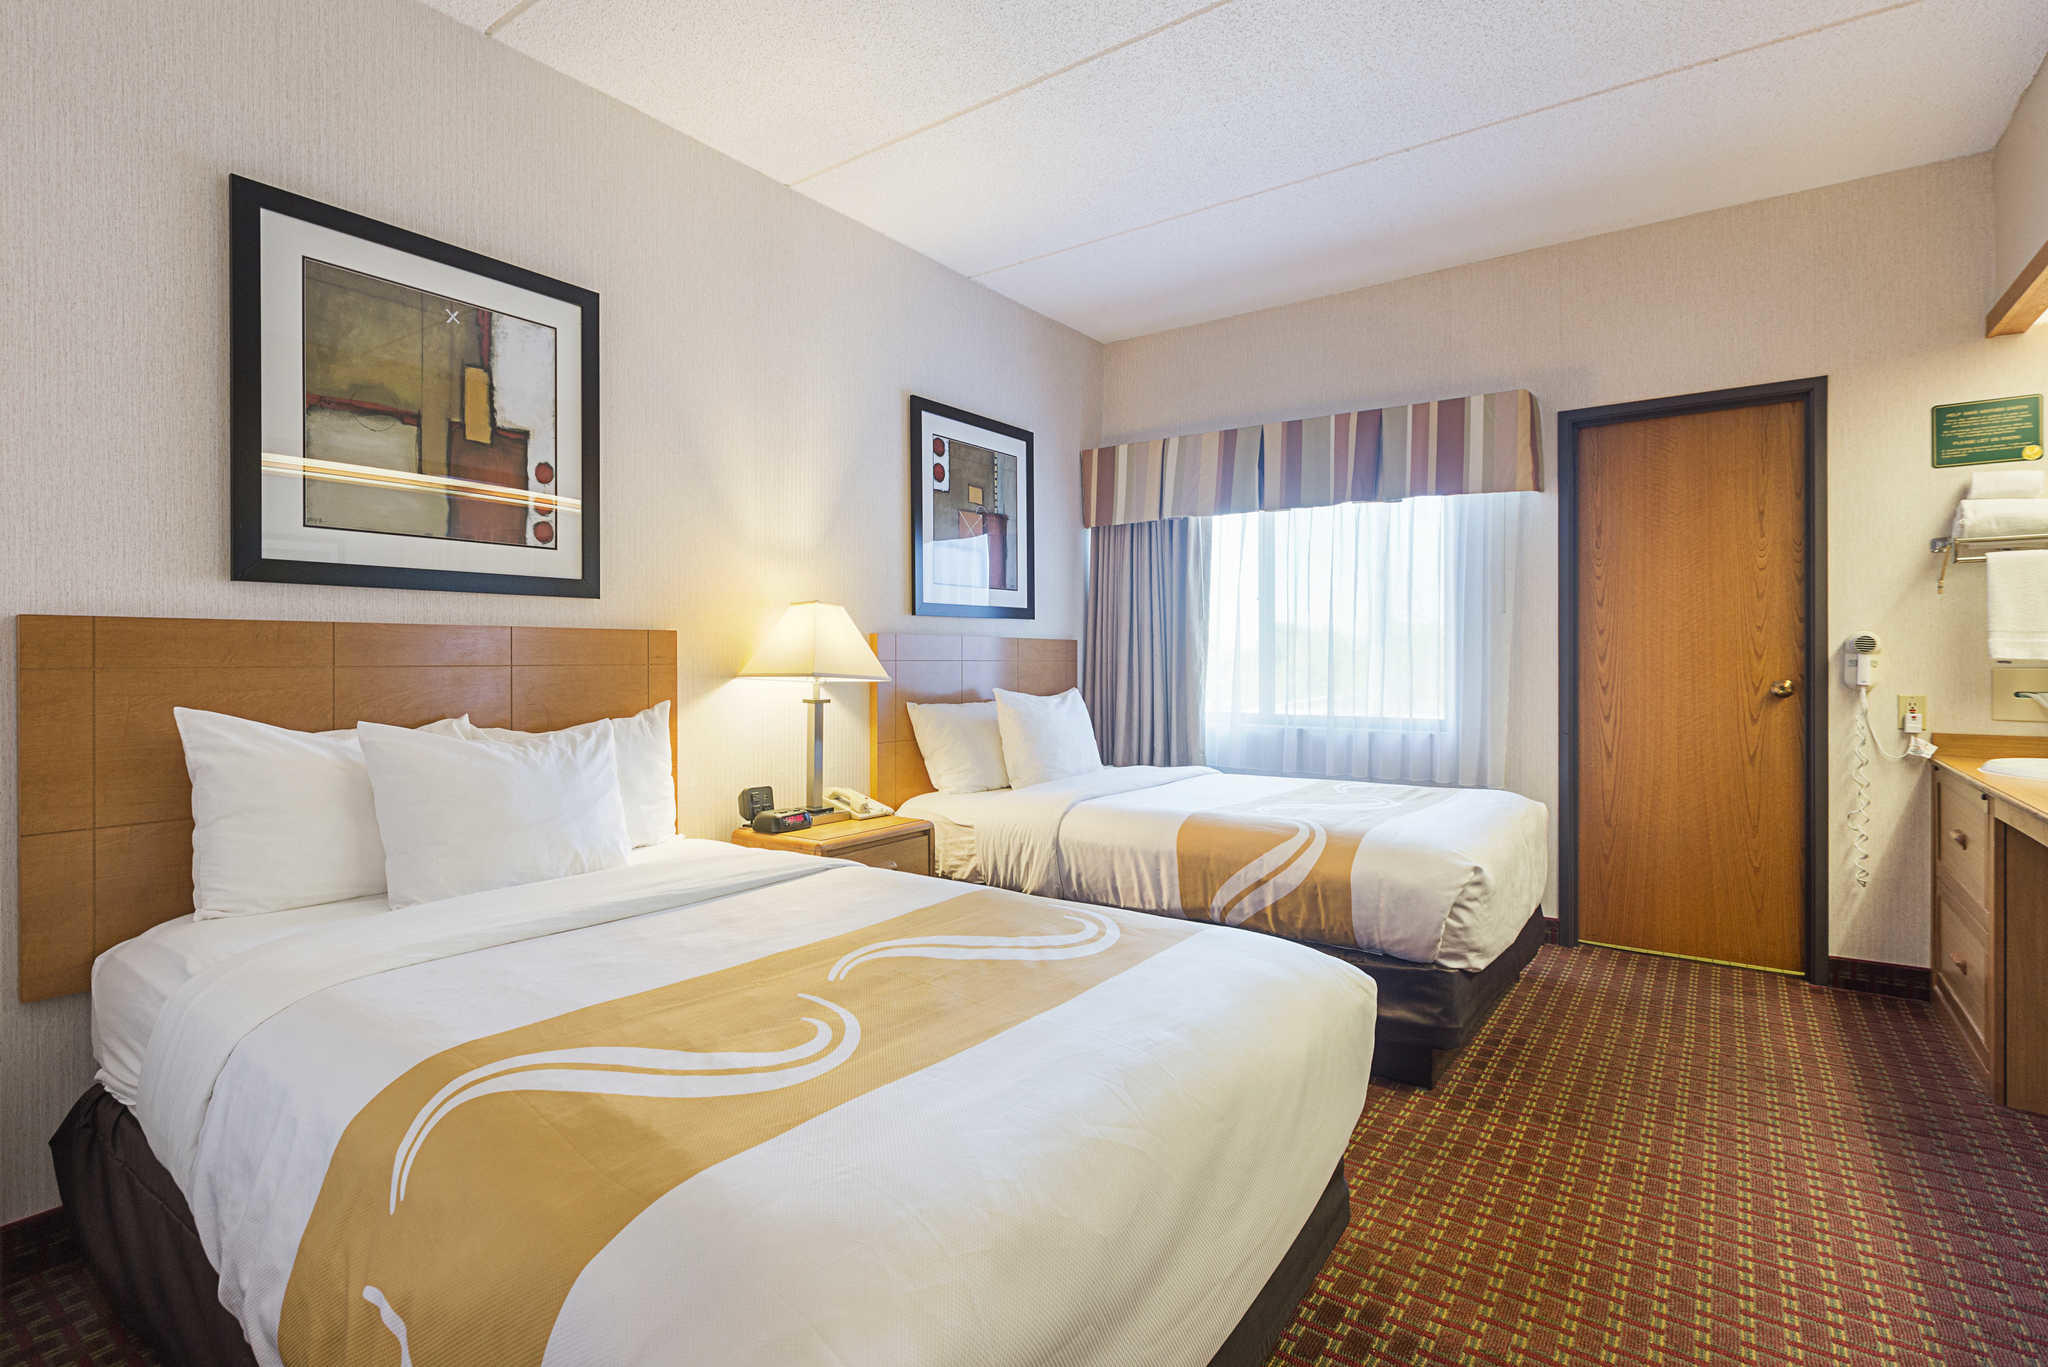 Quality Suites image 12